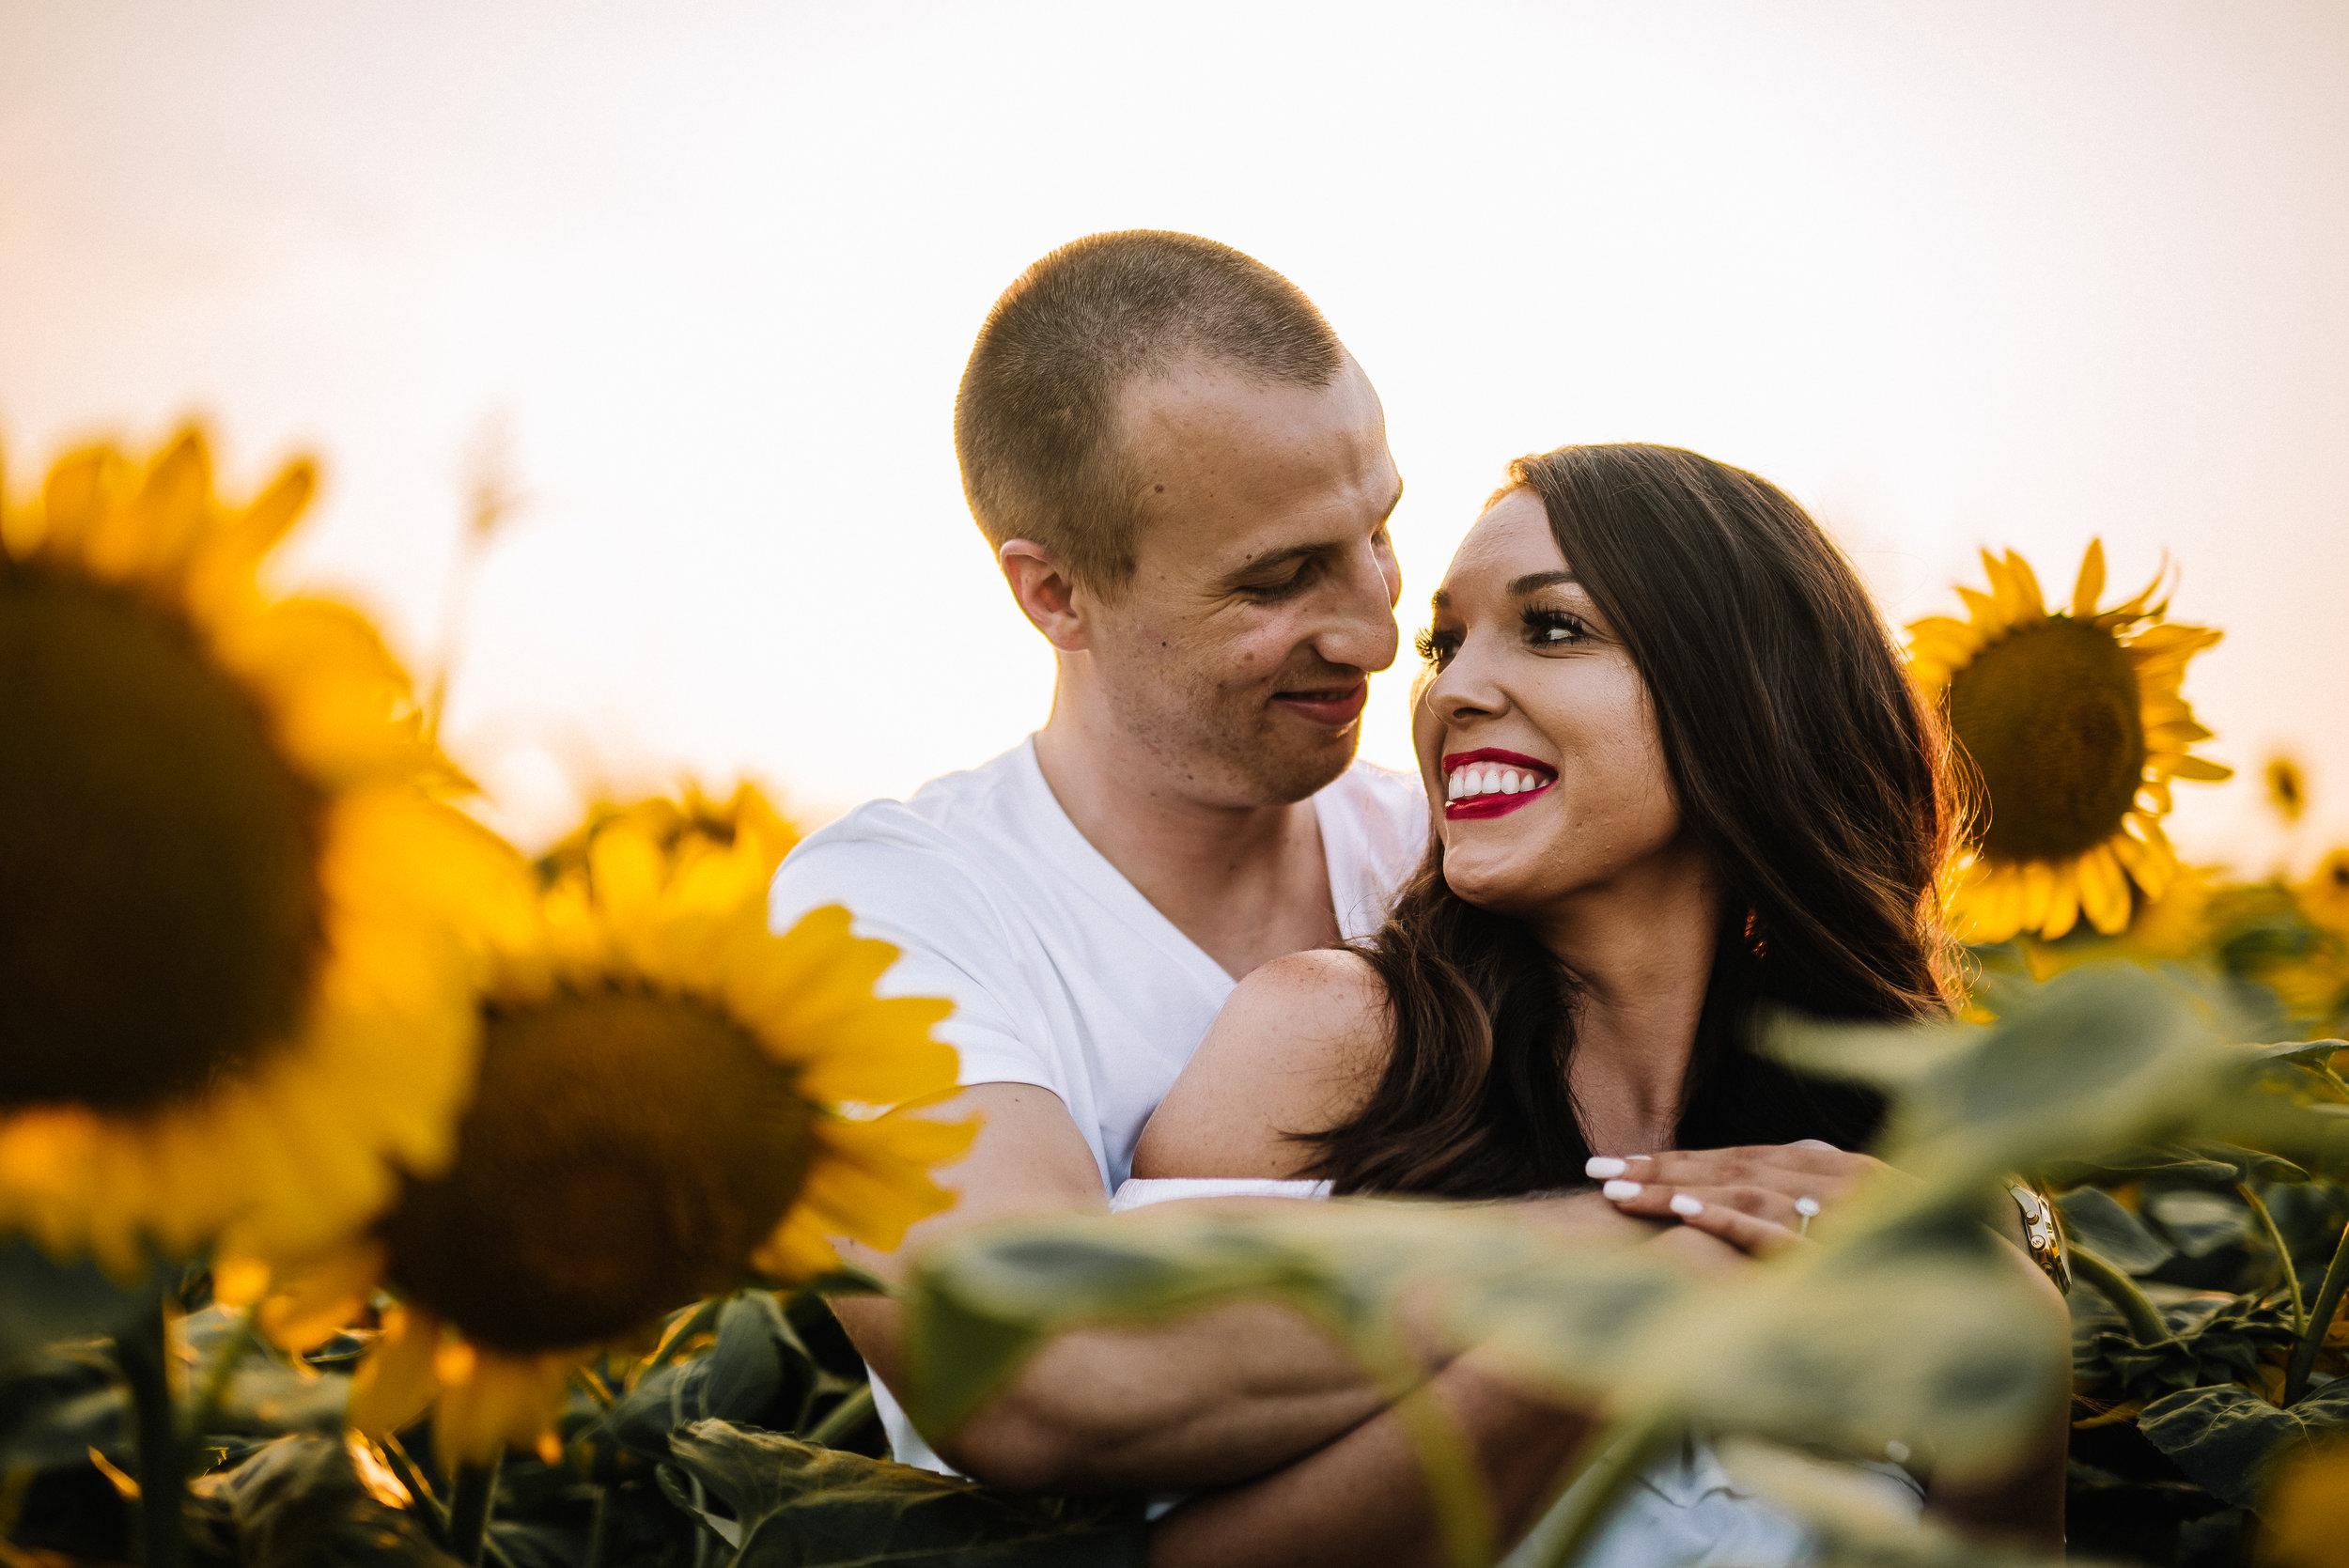 Kaitlynne&Van_Sunflowers_Ashley-Benham-Photography-10.jpg